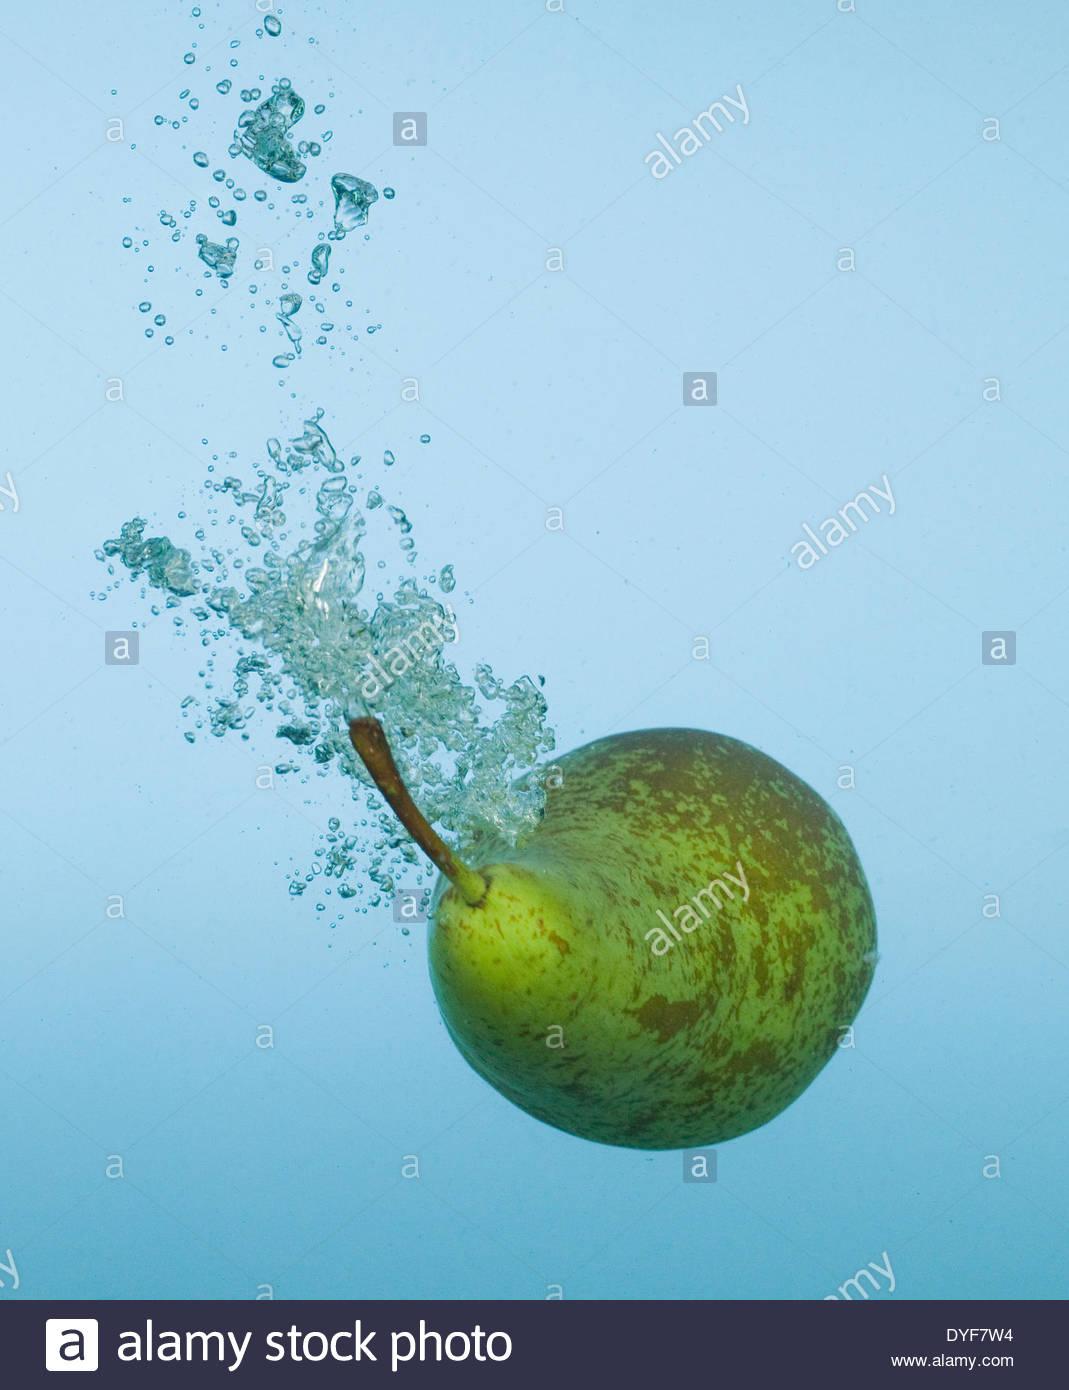 Poire splashing in water Photo Stock